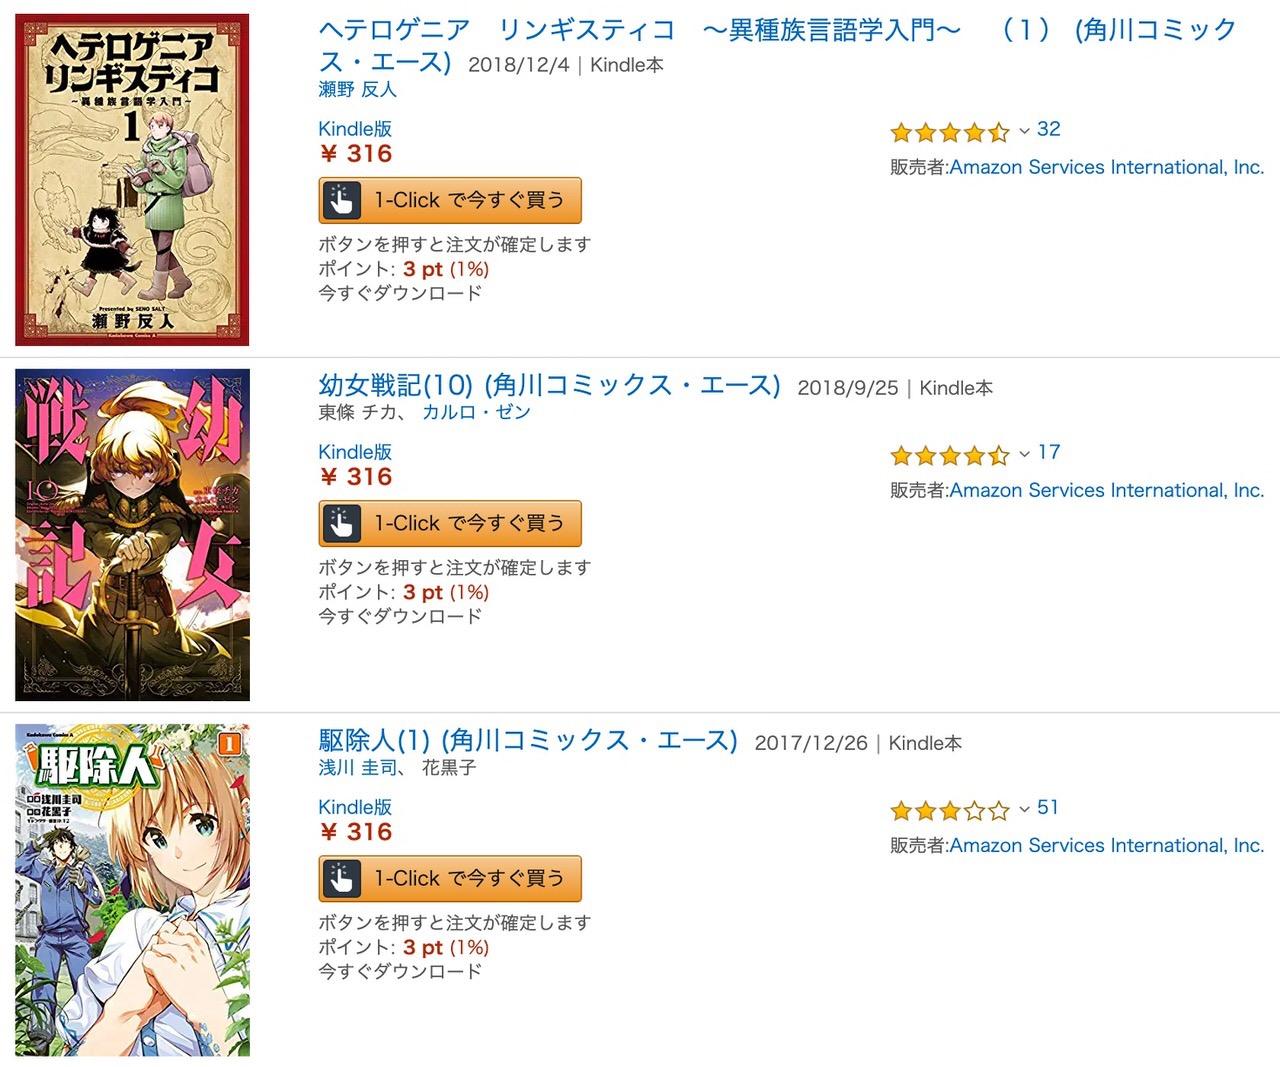 【Kindleセール】1万冊以上が40%OFF以上「Kindle秋の読書フェア」(10/17まで)